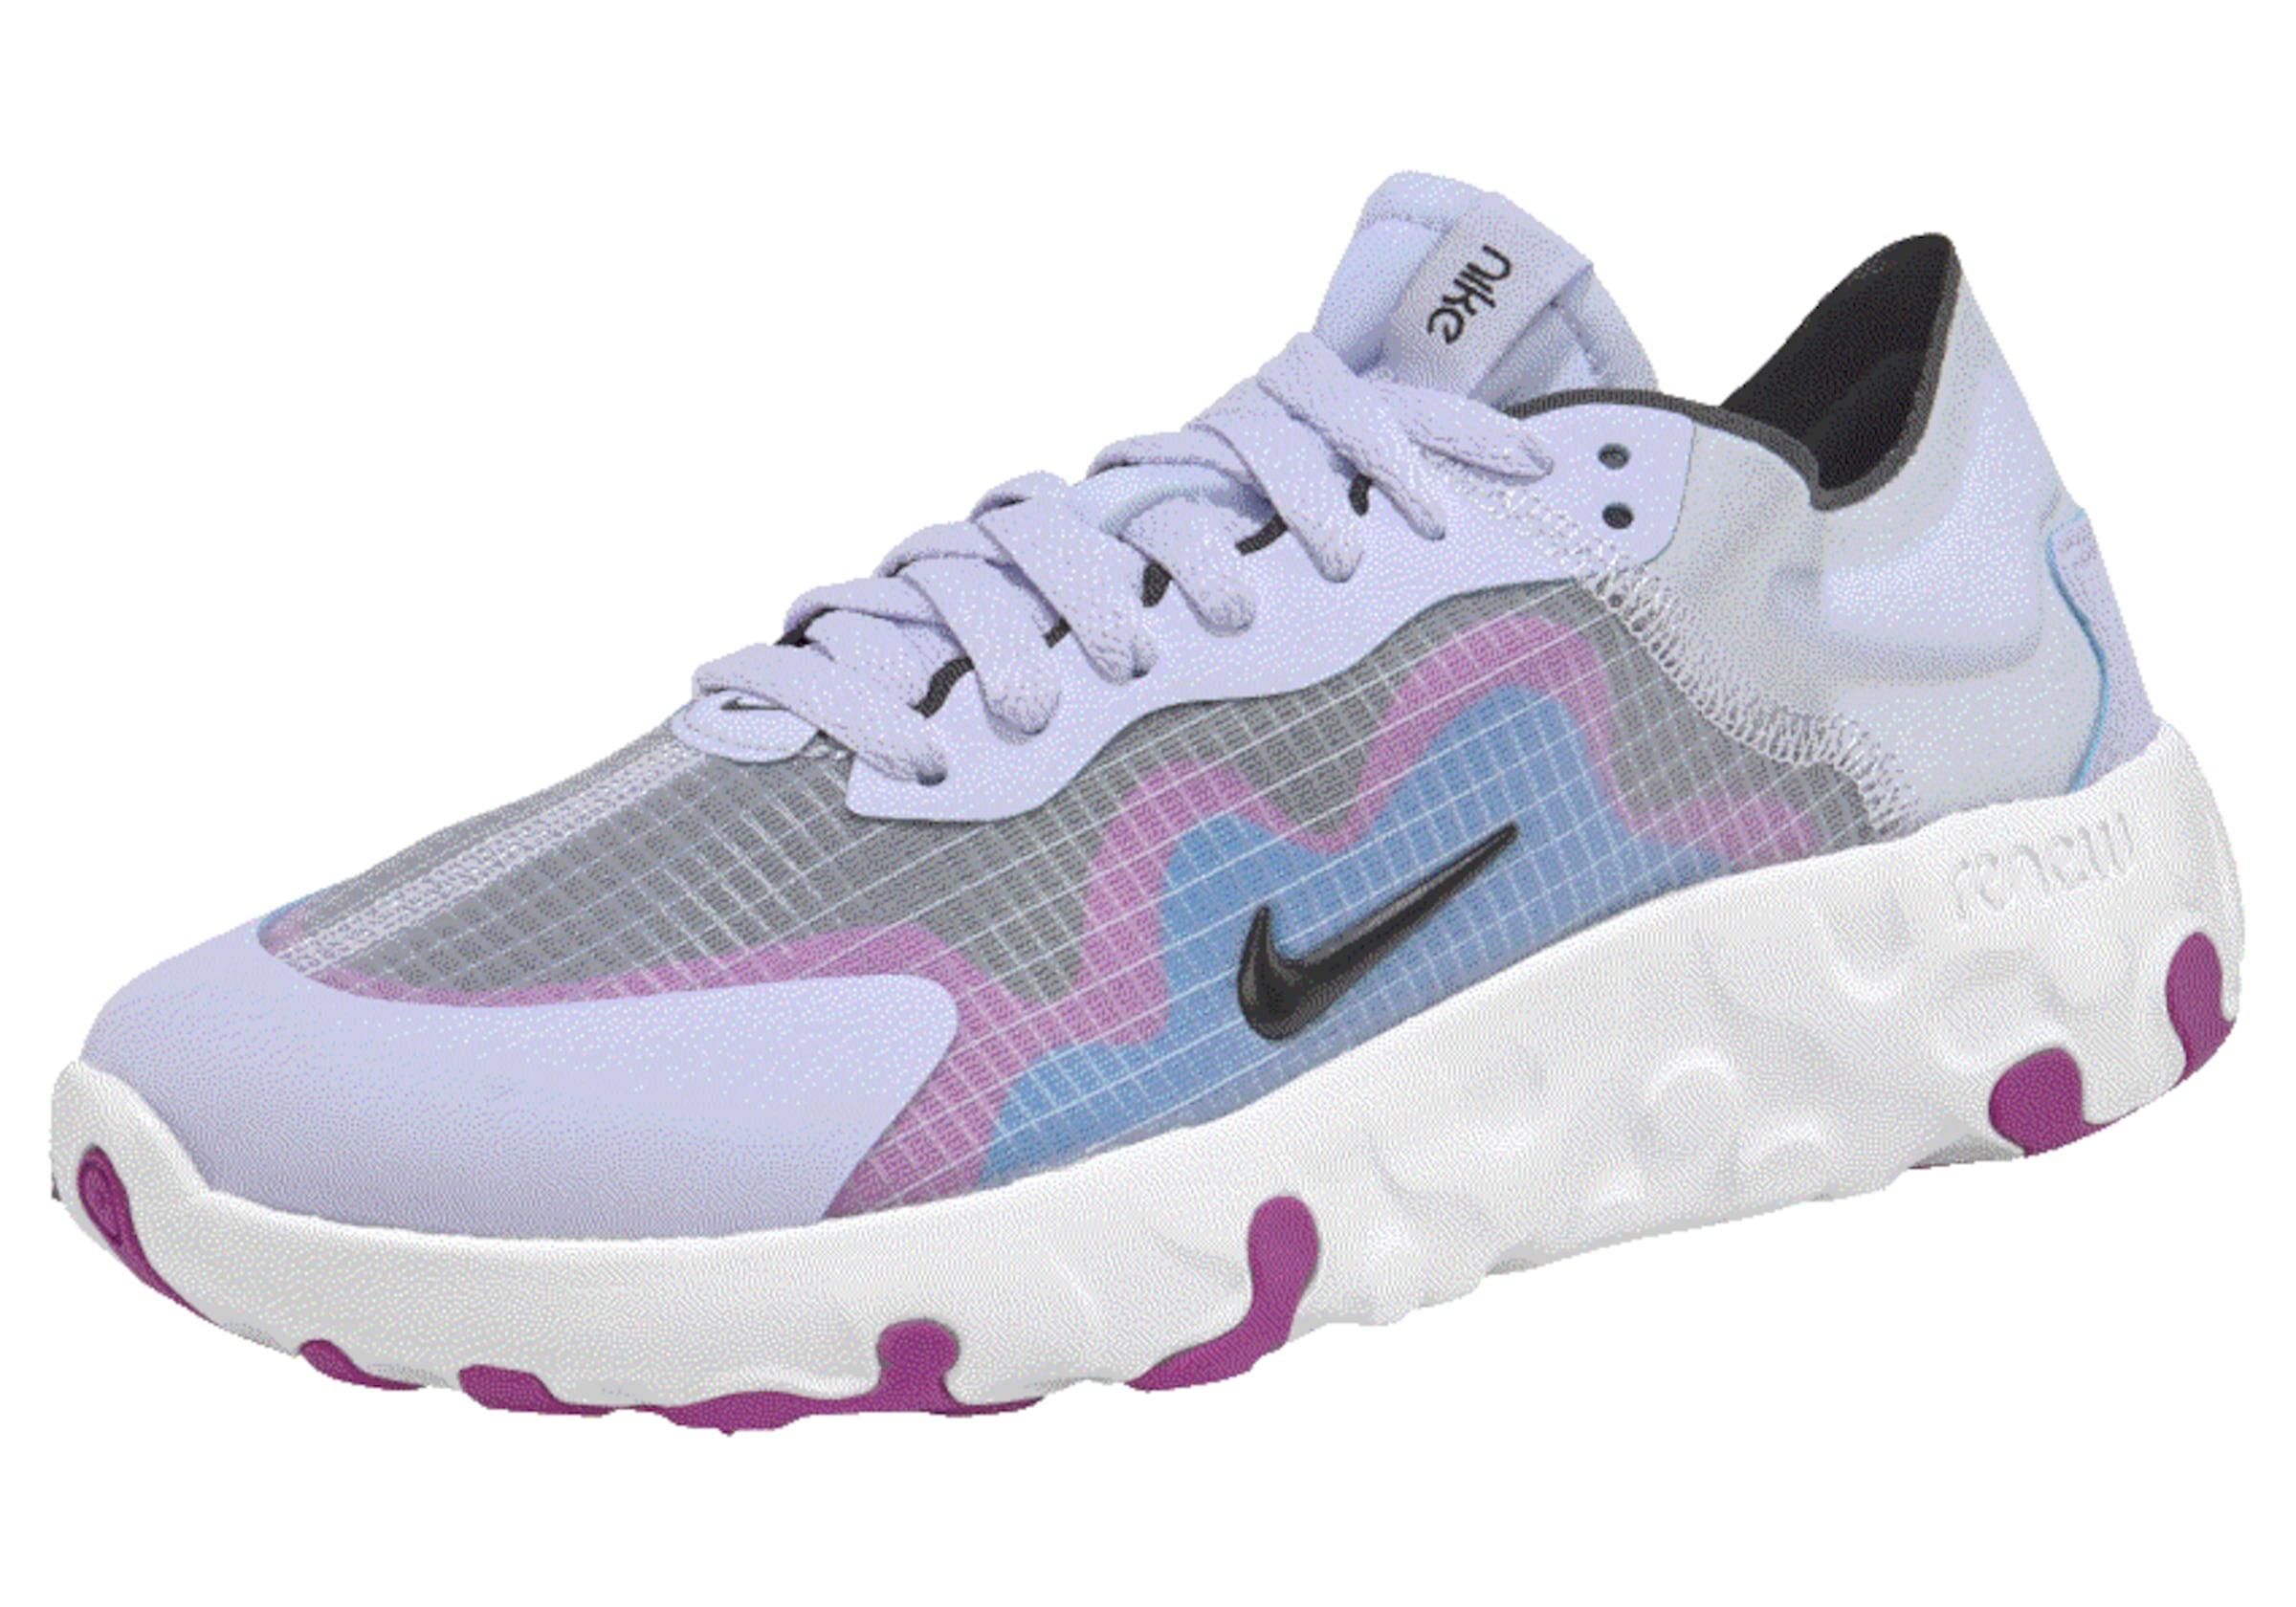 Nike Sportswear Turnschuhe 'Wmns Renew Lucent' in mauve